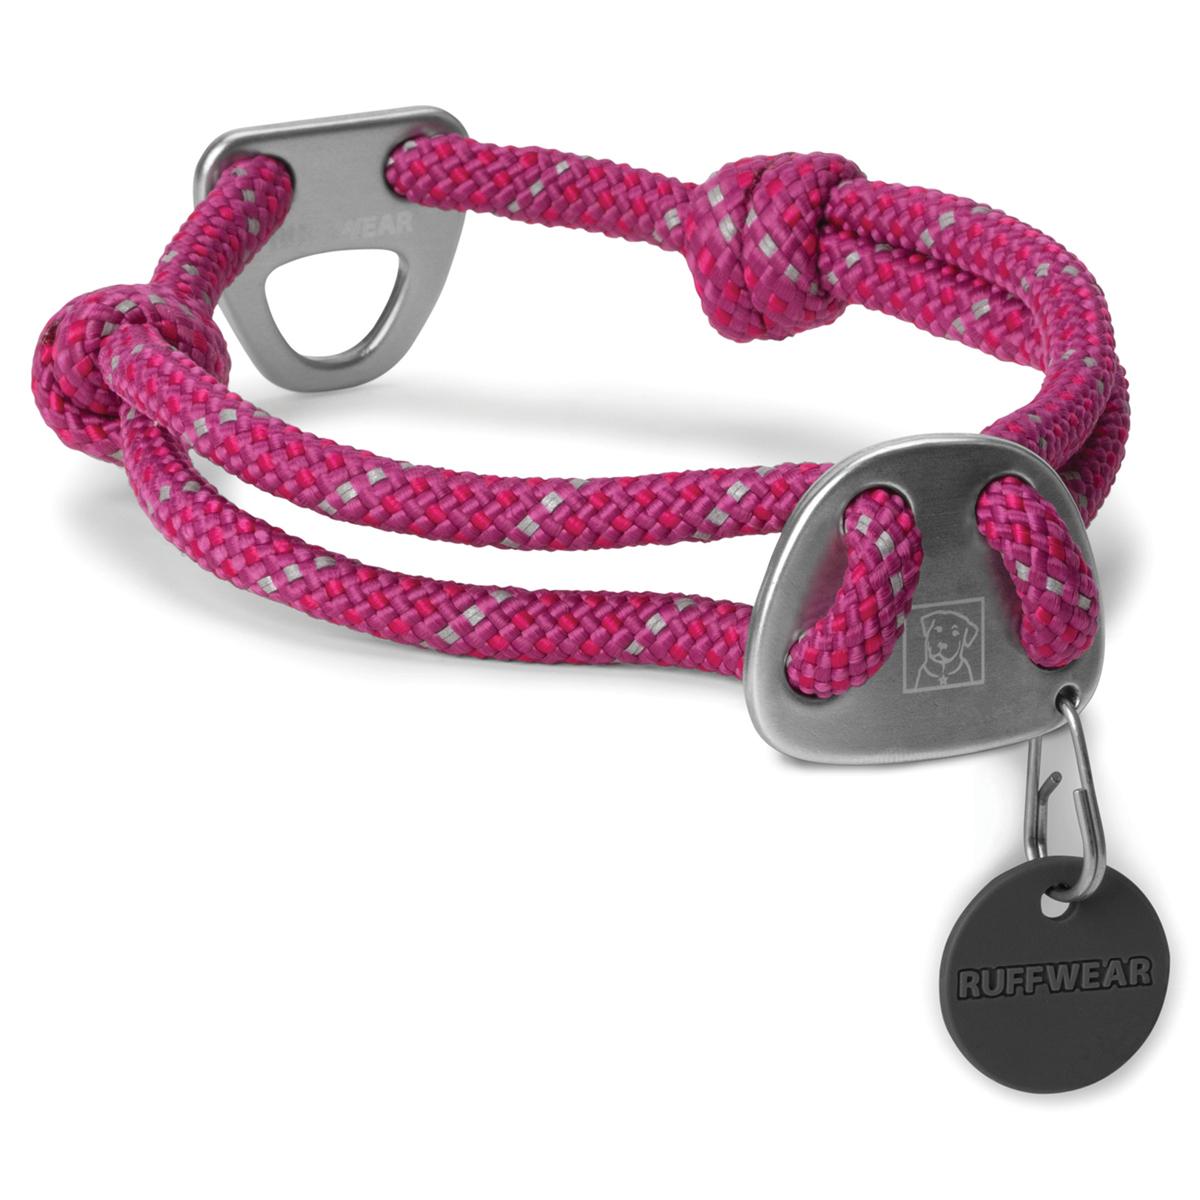 Knot-A-Collar for Dogs by RuffWear - Purple Dusk